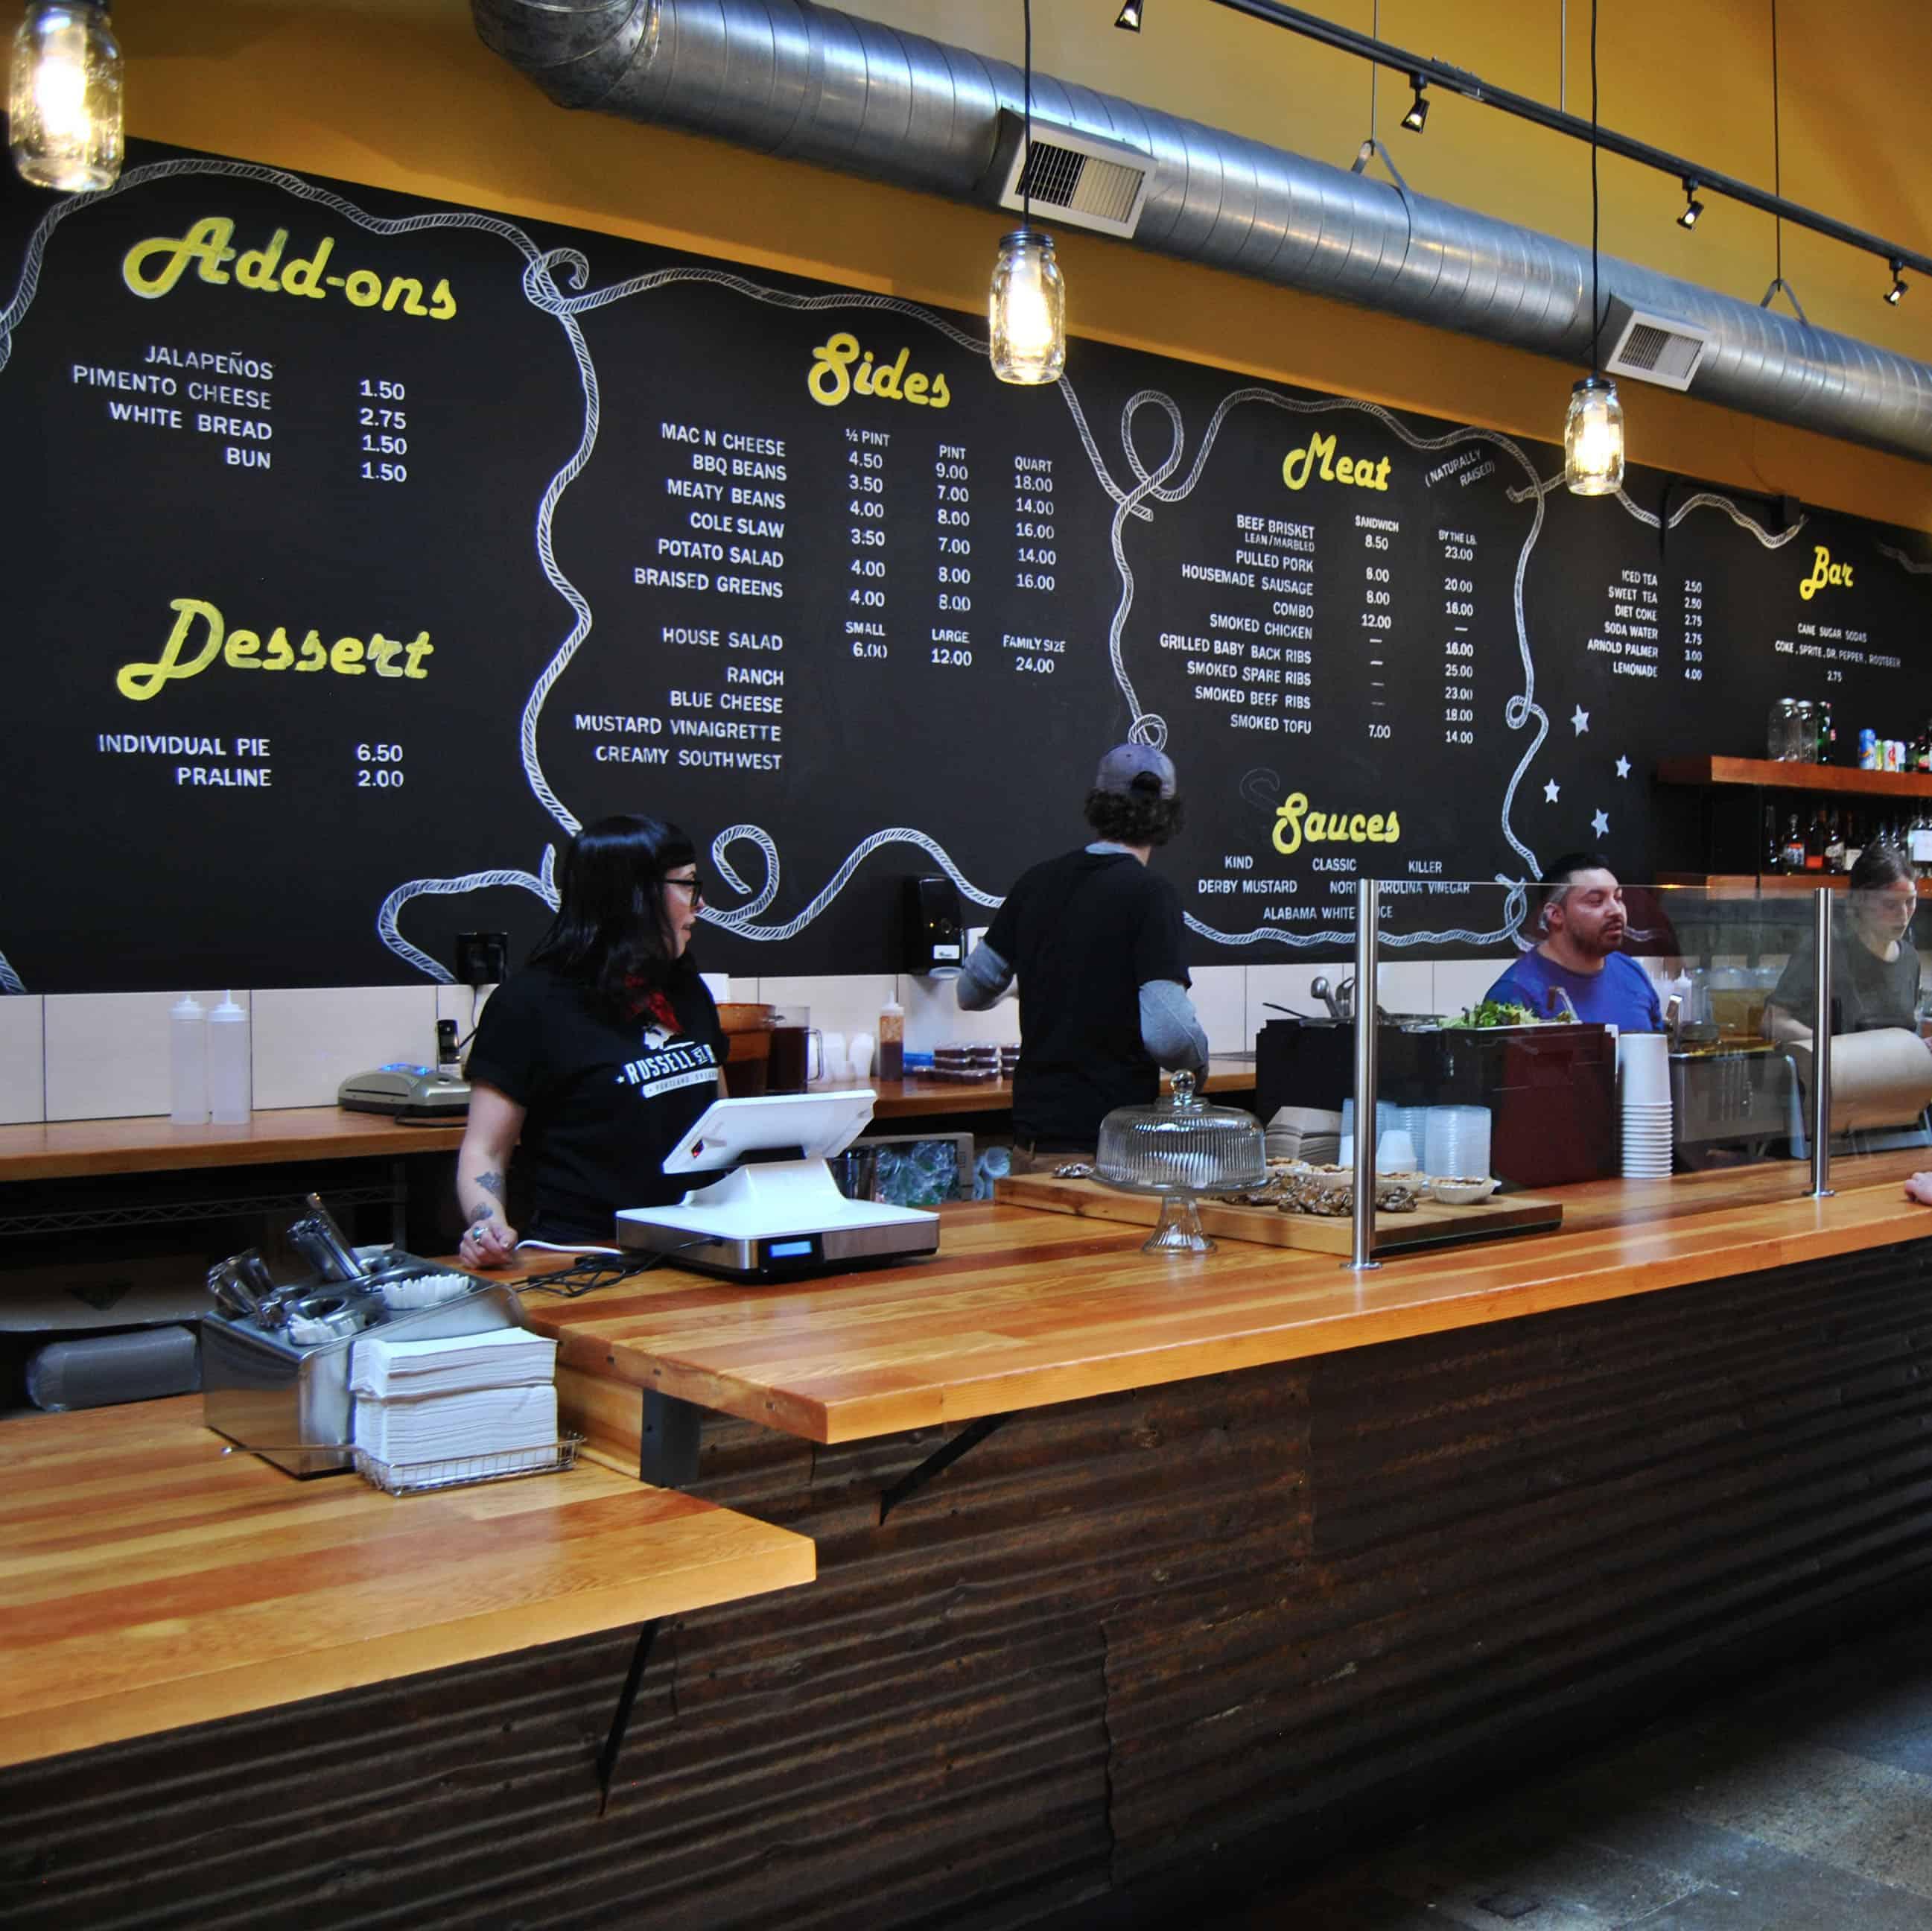 restaurant interior design portland with chaulkboard menu